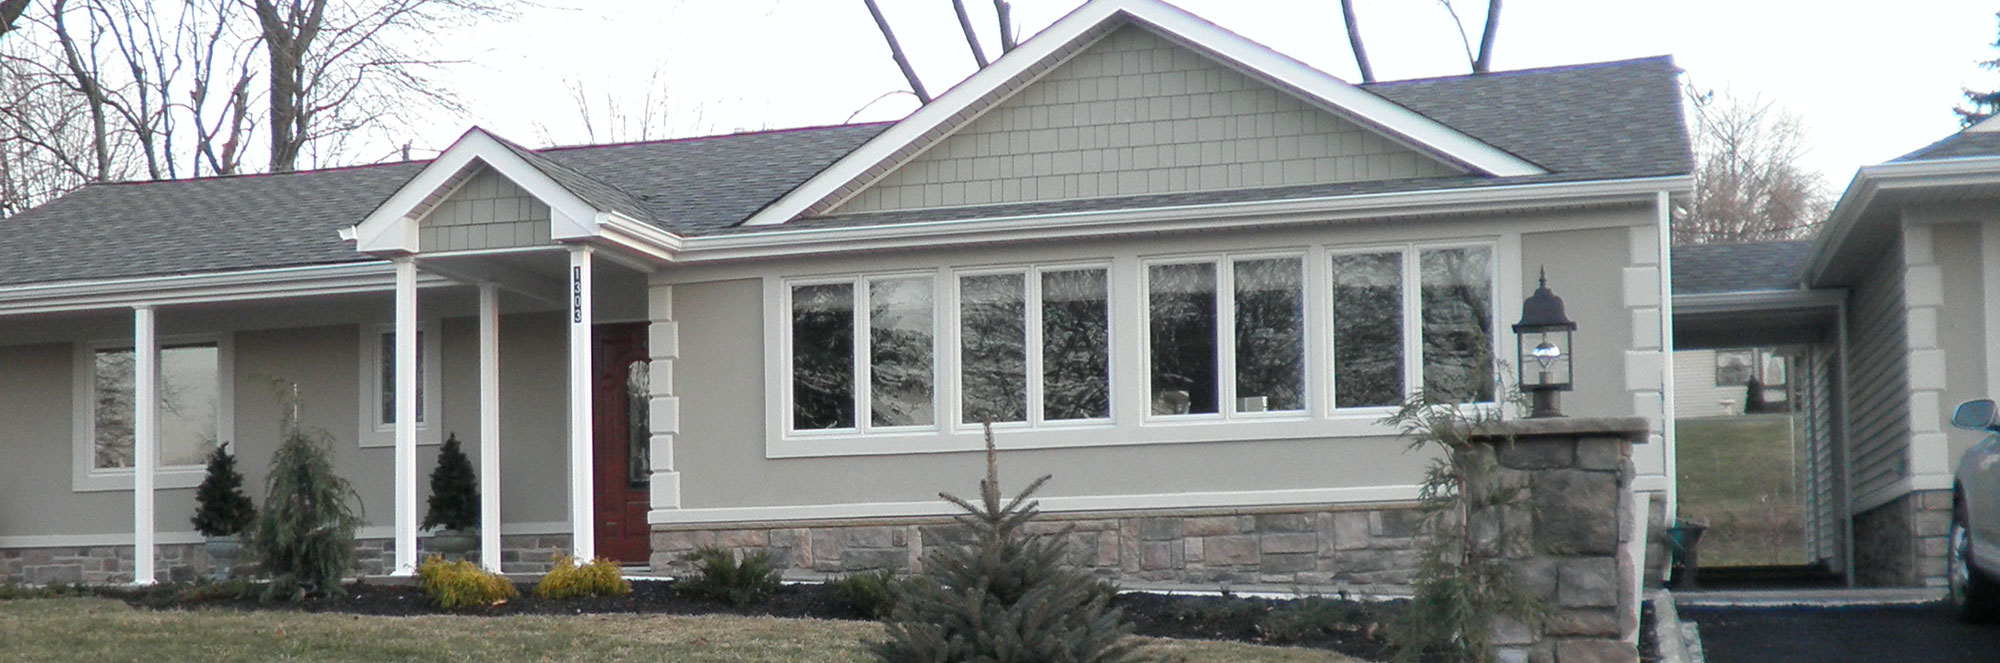 Plainsboro residence stucco and siding